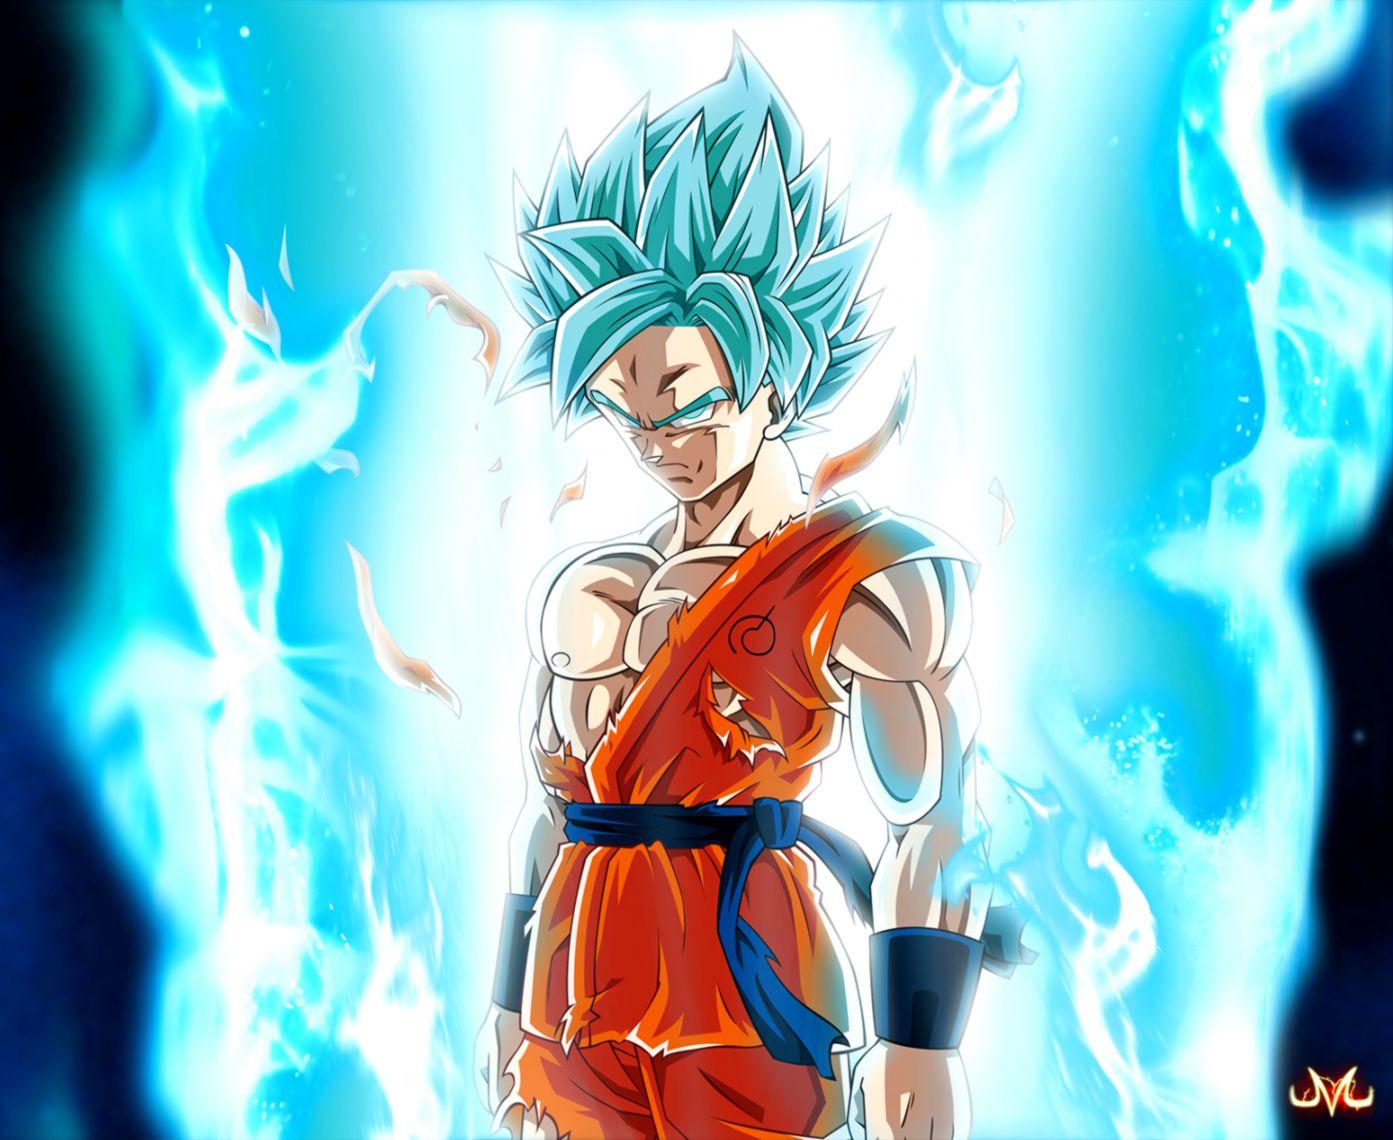 Goku Super Saiyan God Wallpaper Posted By Sarah Walker